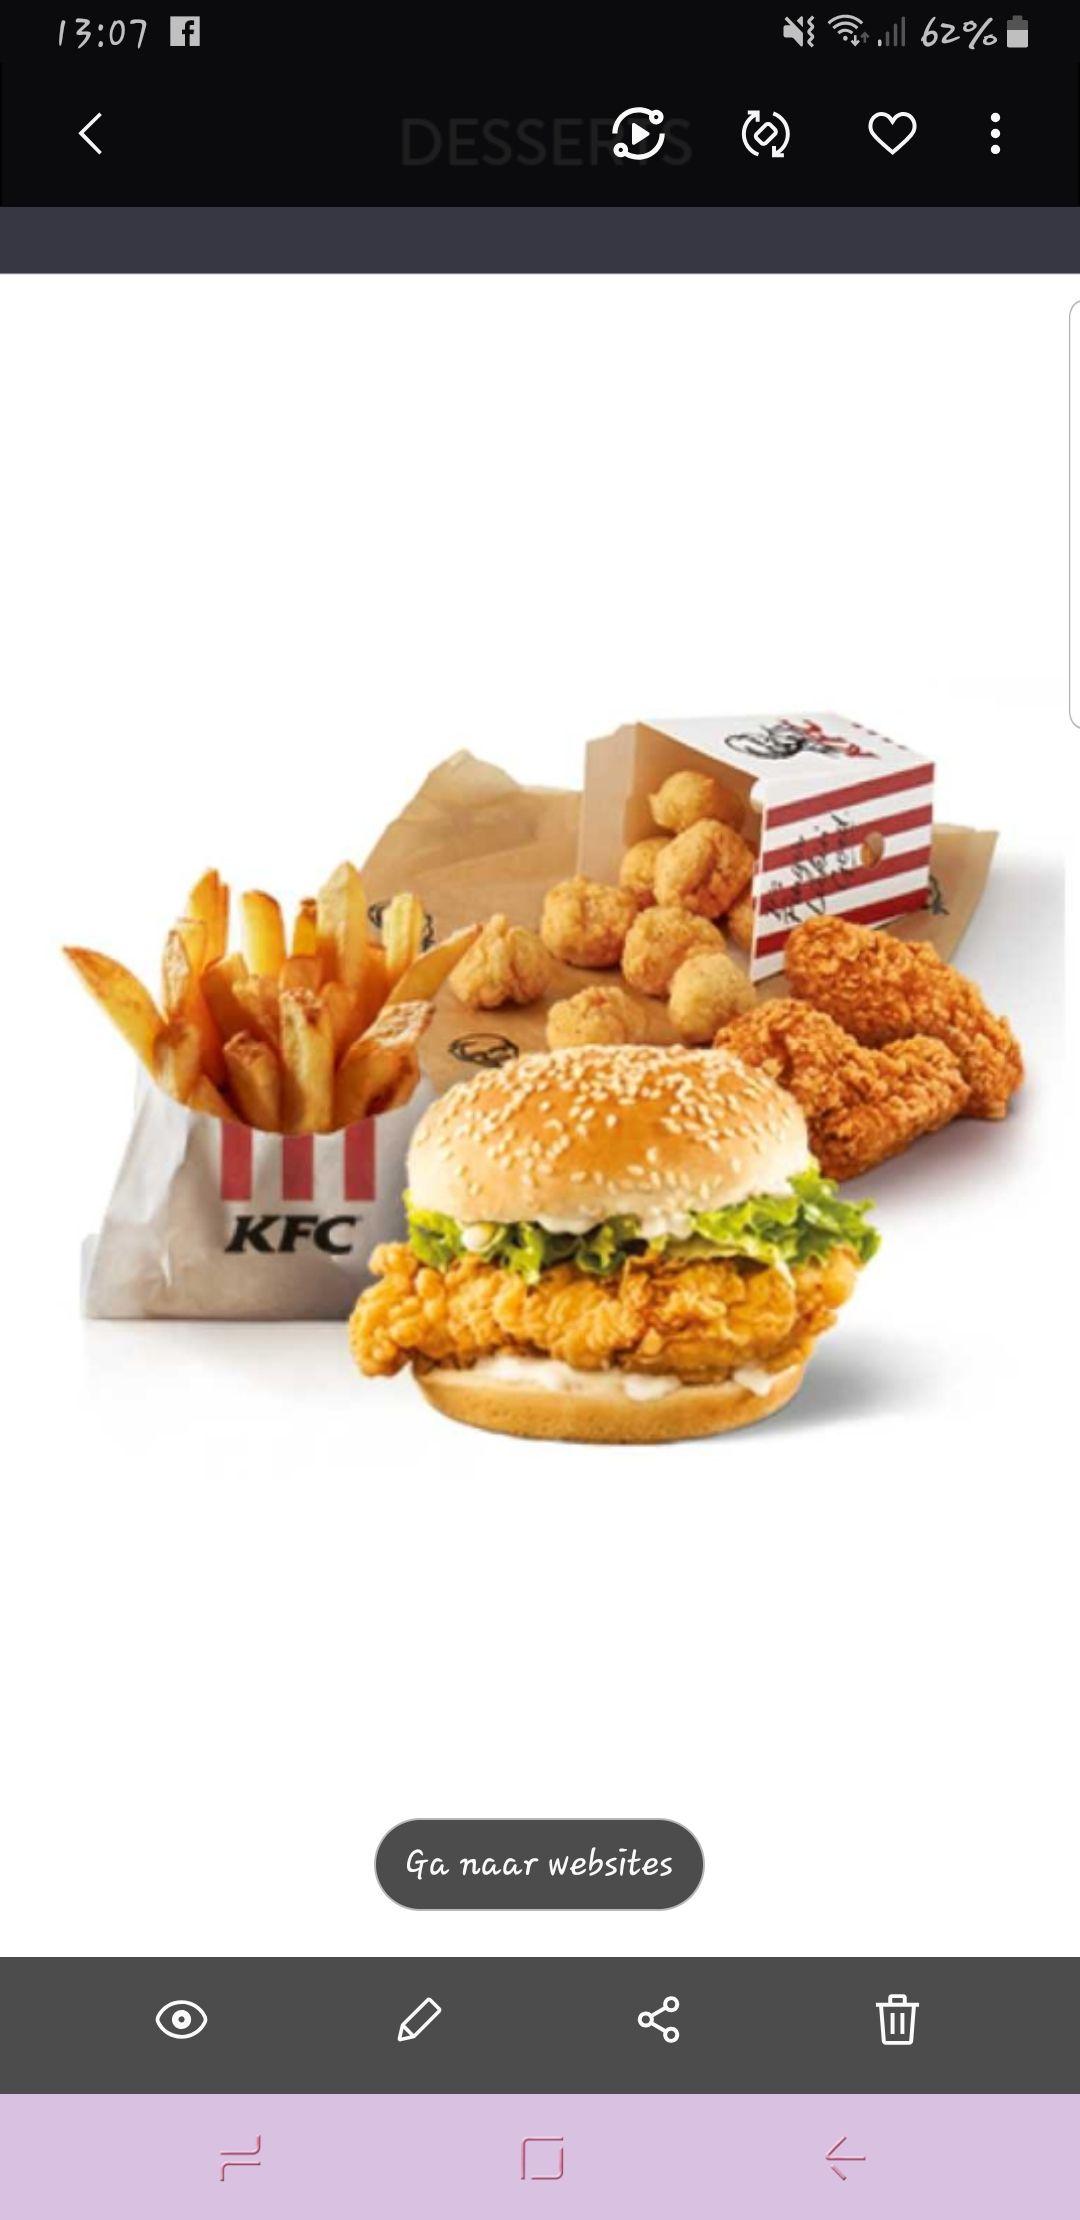 Variety Deal @ KFC